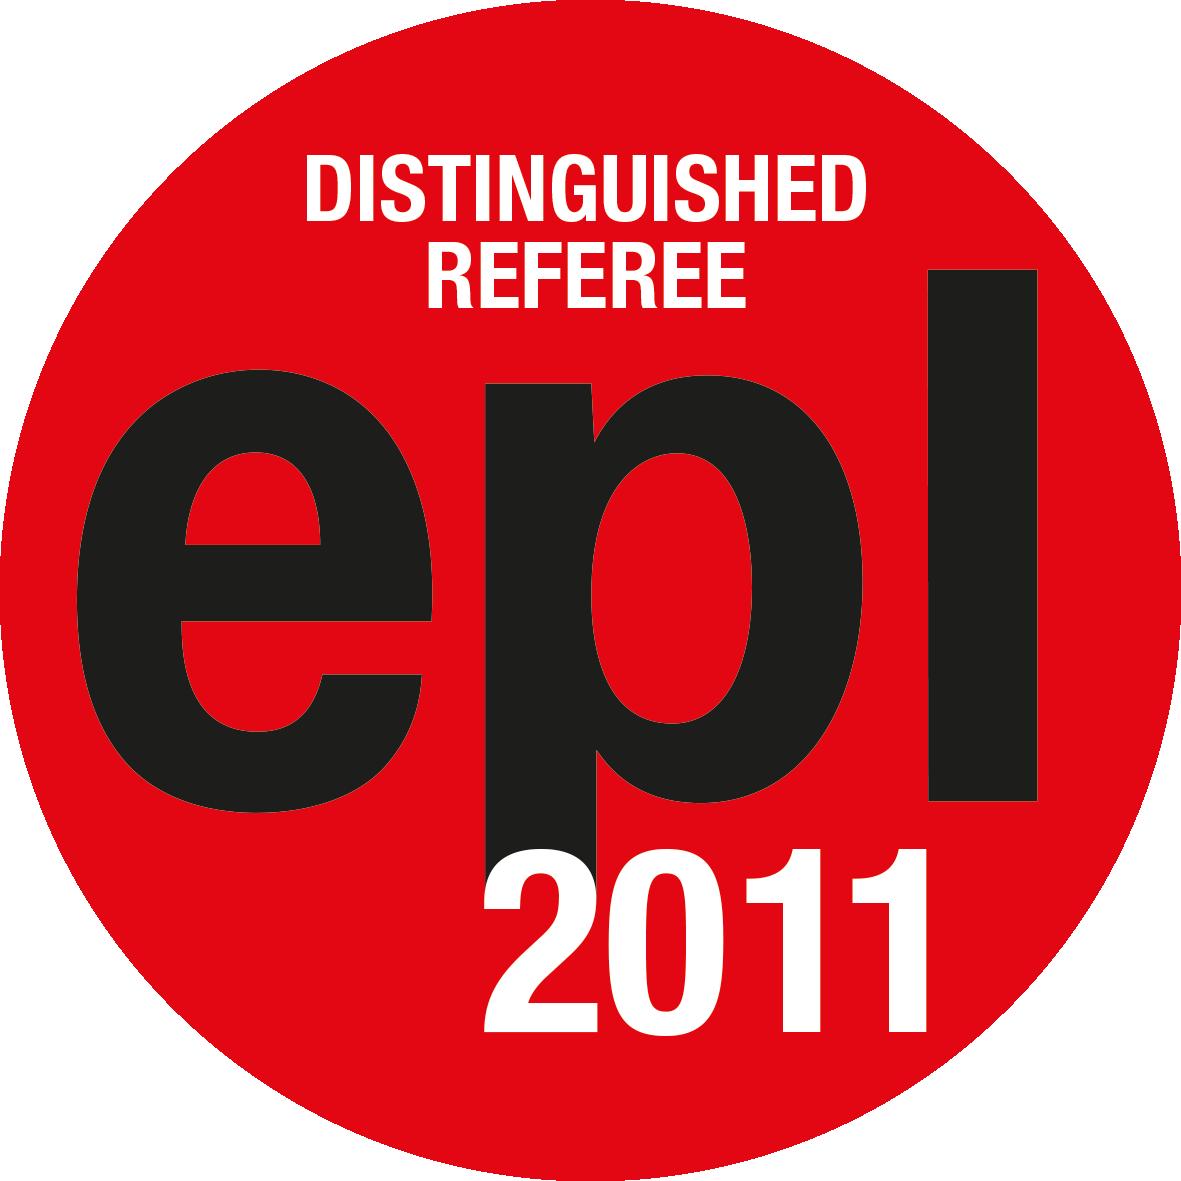 EPL Distinguished Referees 2011